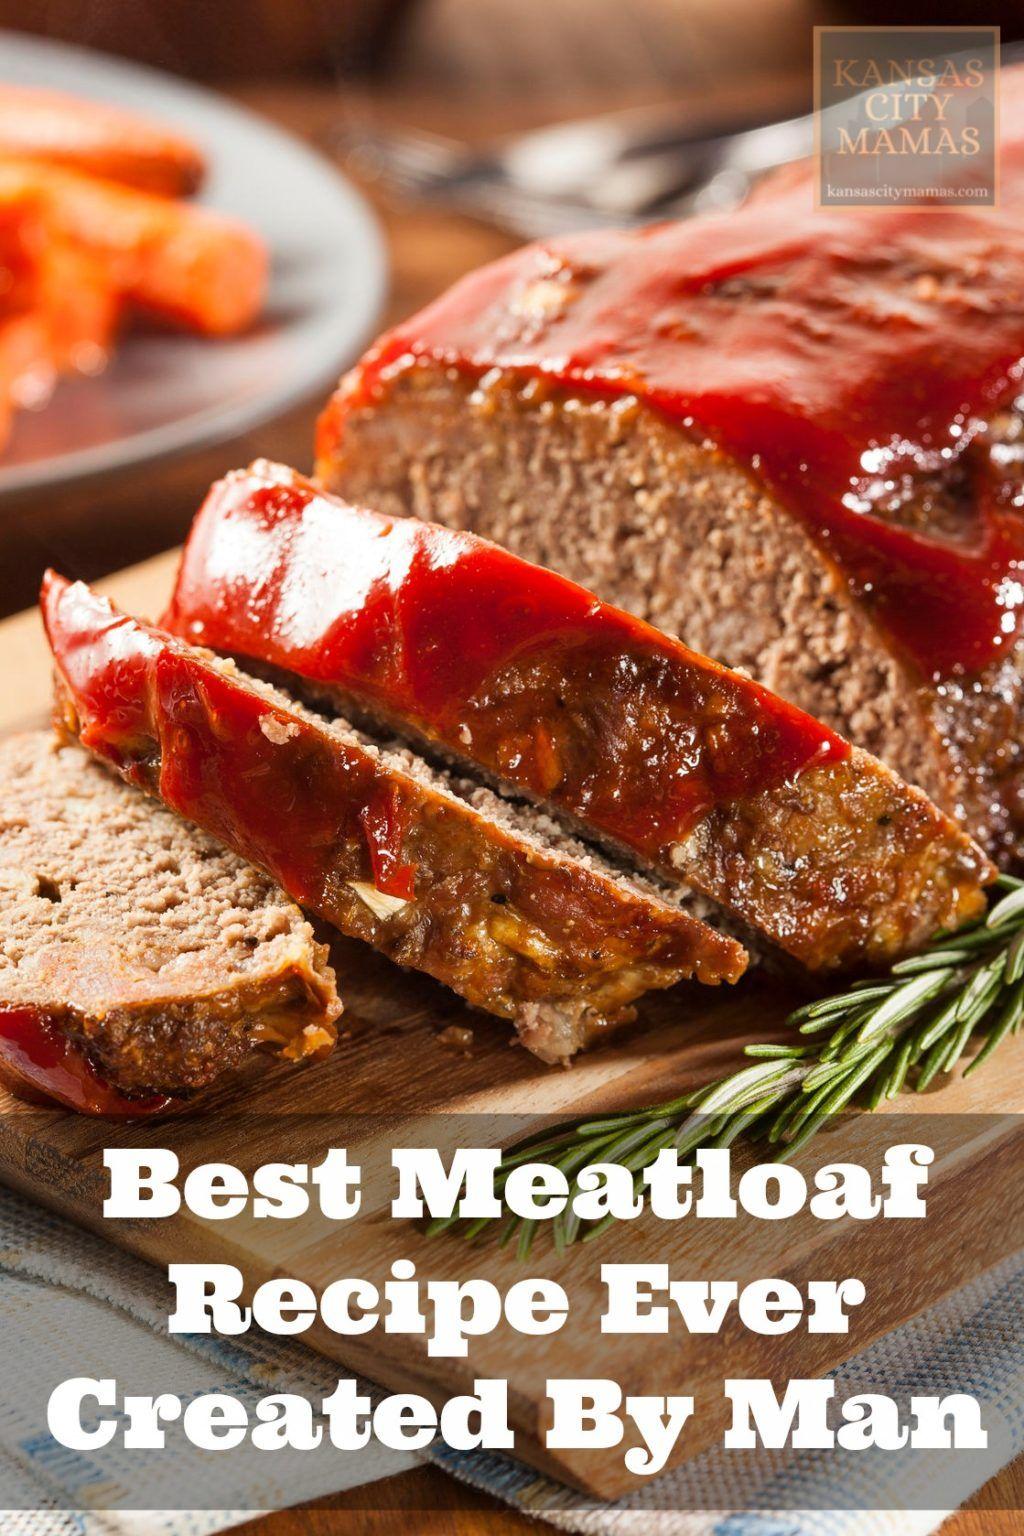 Ketchup Glazed Quick Easy Meatloaf Recipe In 2020 Classic Meatloaf Recipe Traditional Meatloaf Recipes Meatloaf Recipes